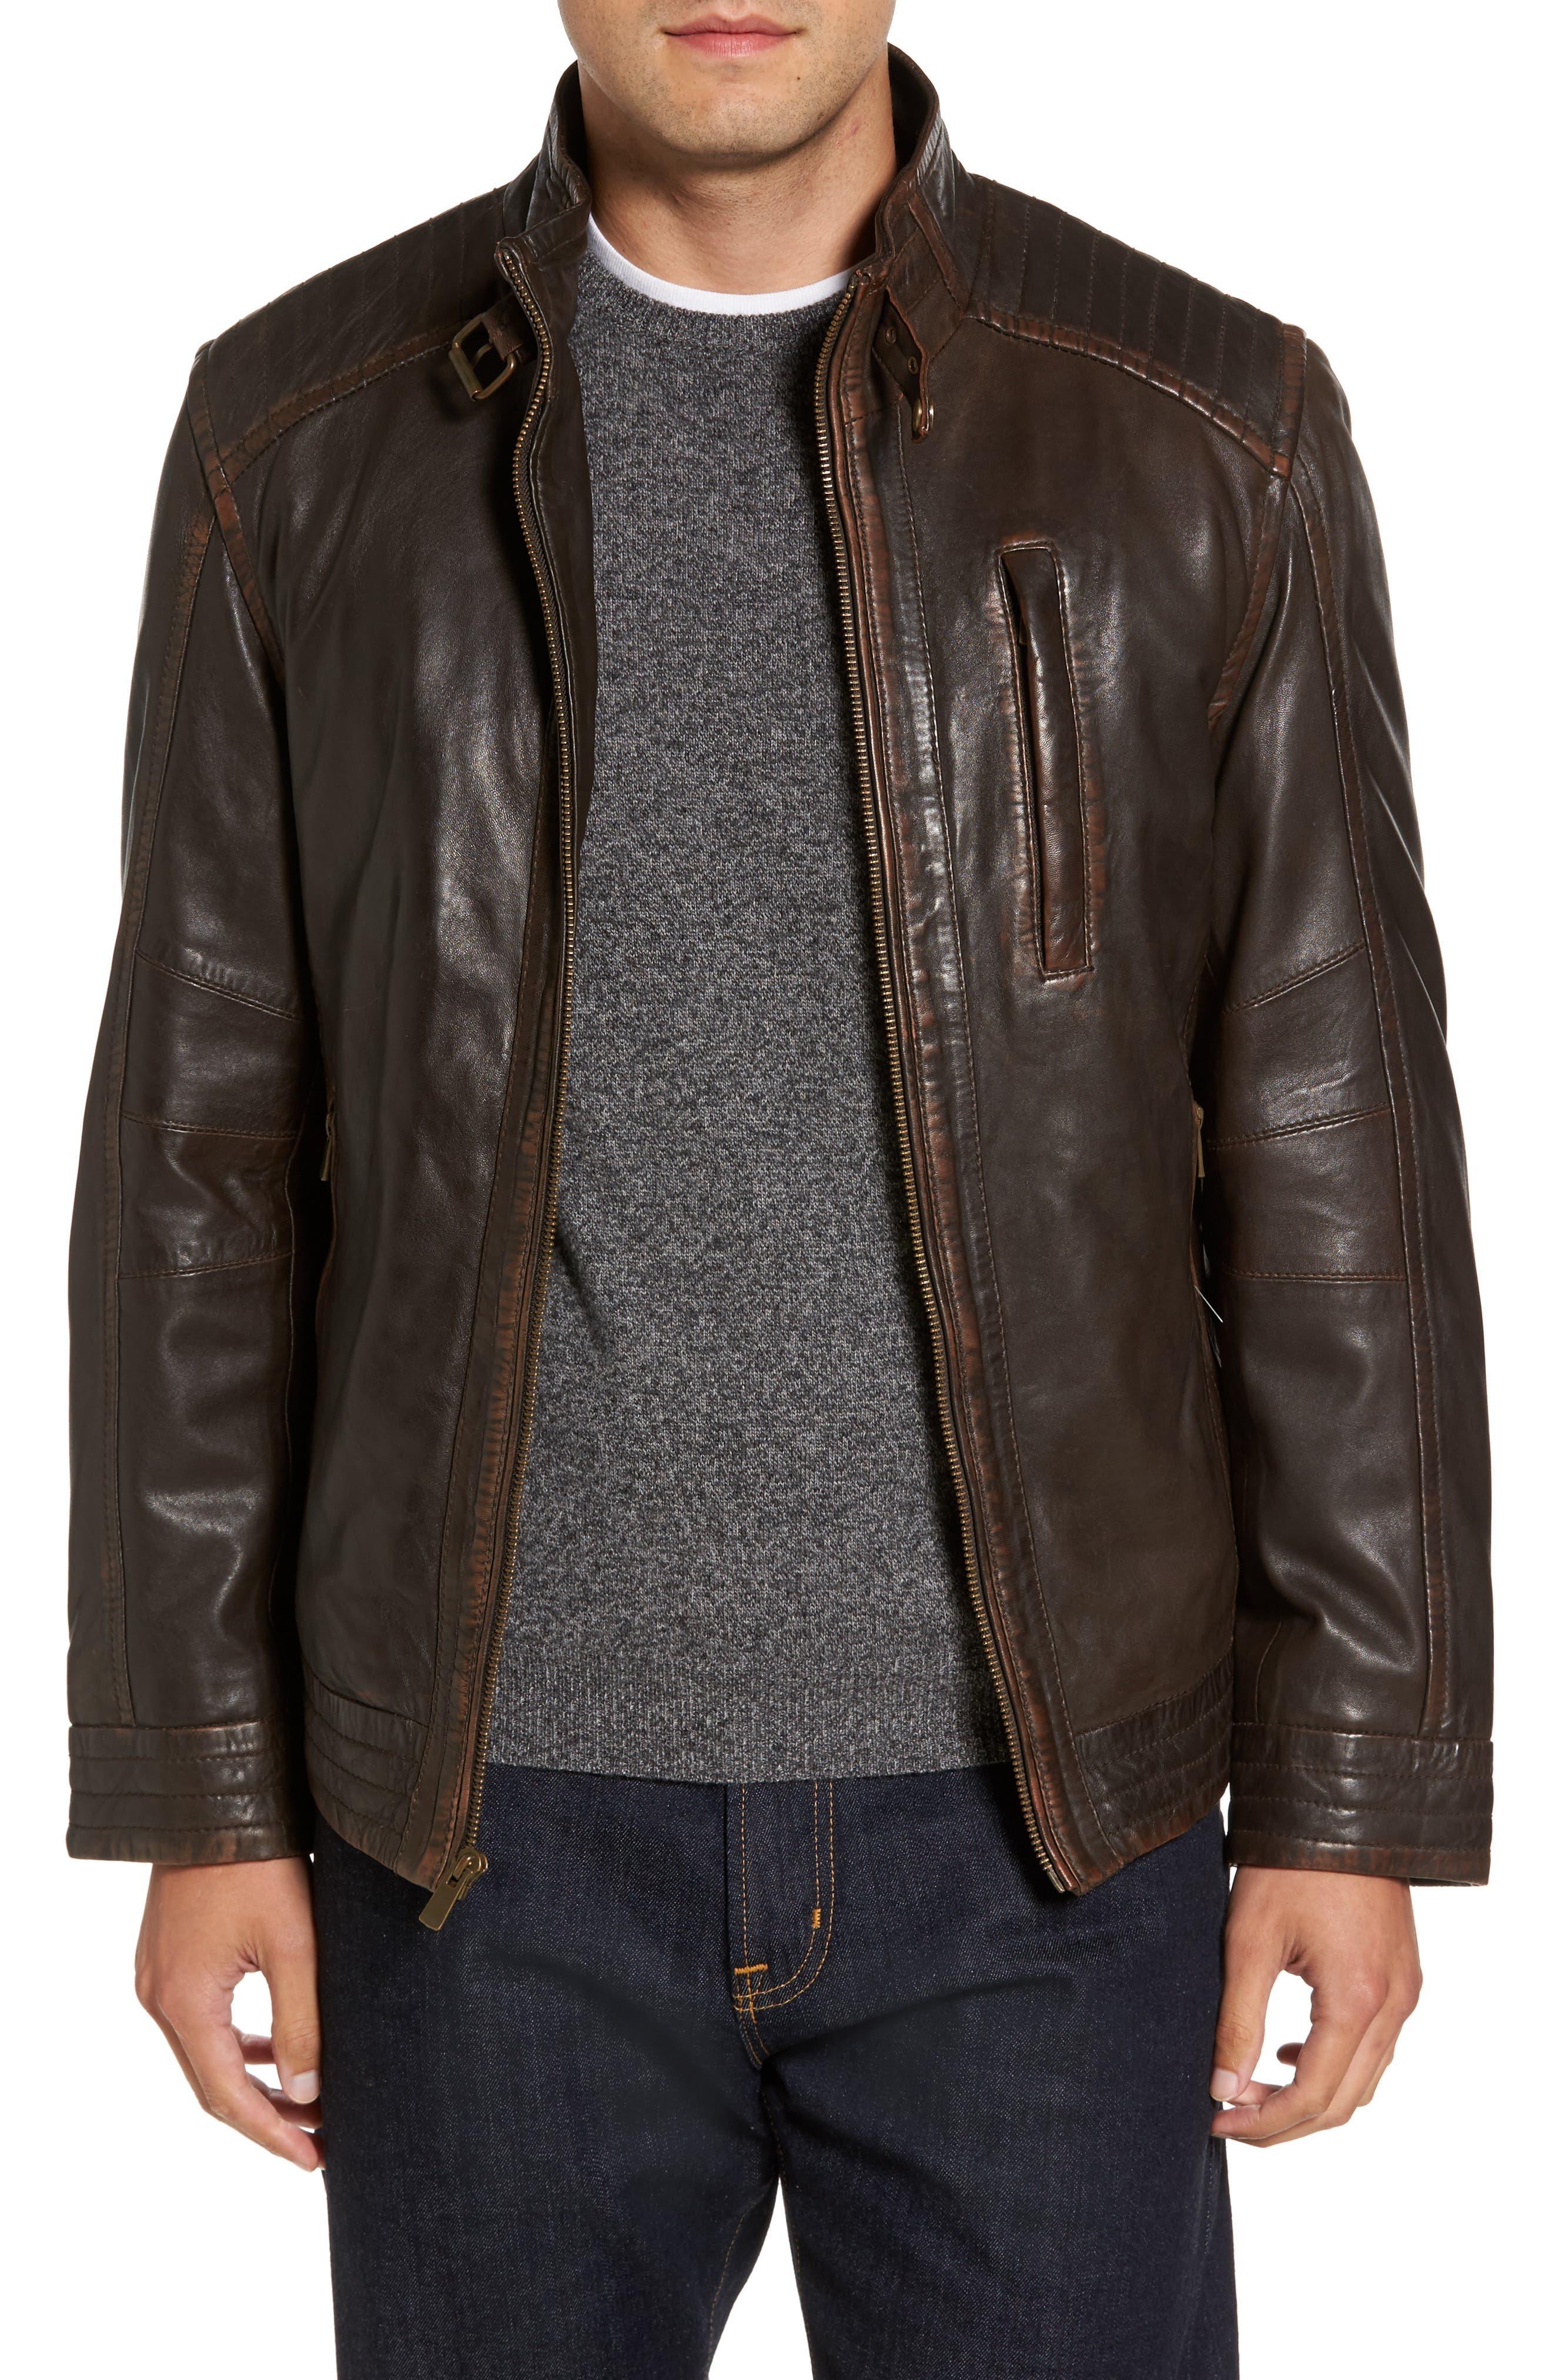 Main Image - Missani Le Collezioni Leather Jacket